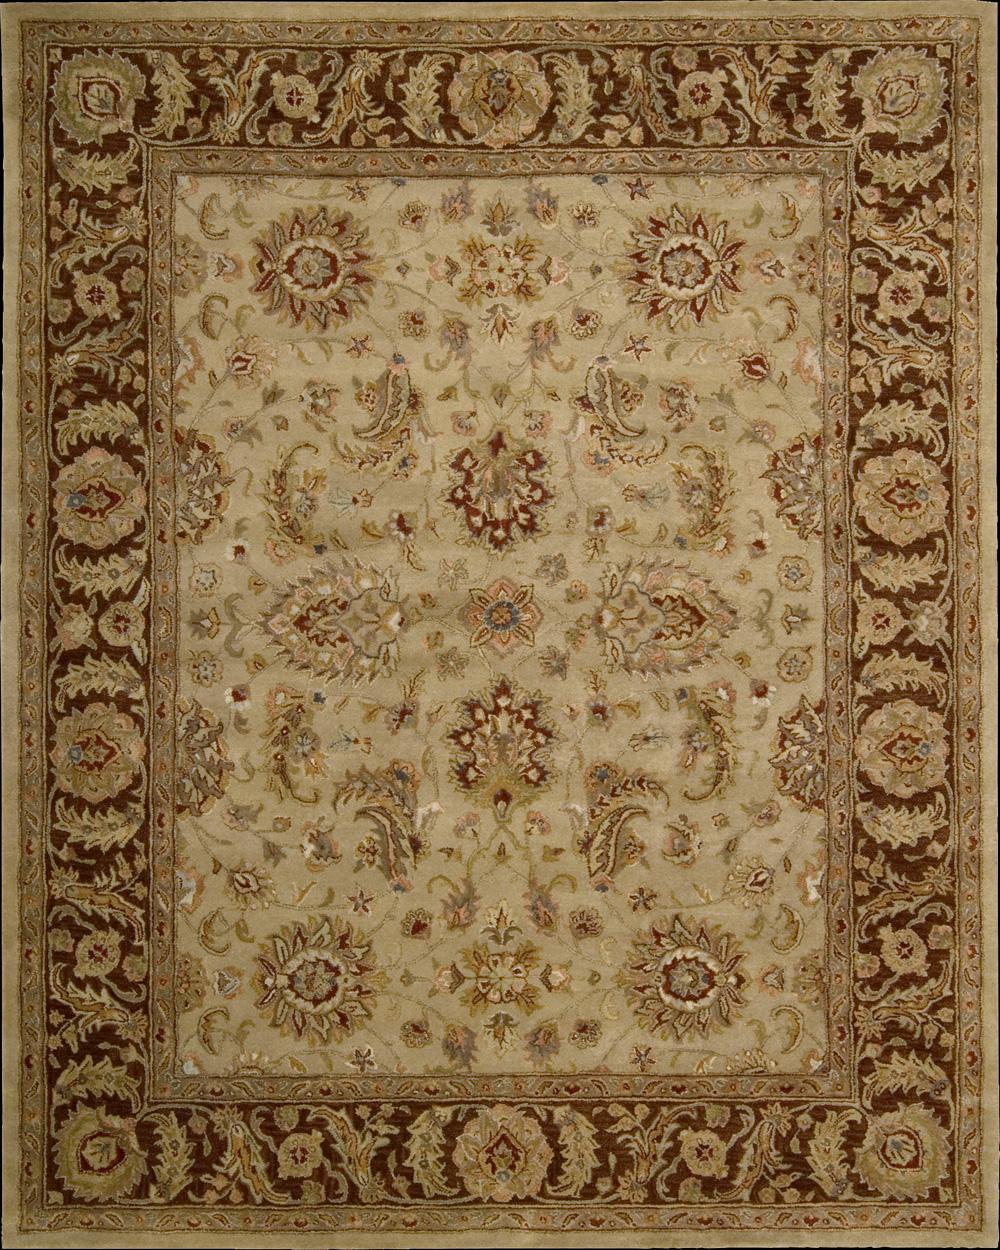 "Nourison Jaipur Area Rug 3'9"" x 5'9"" - Item Number: 85605"